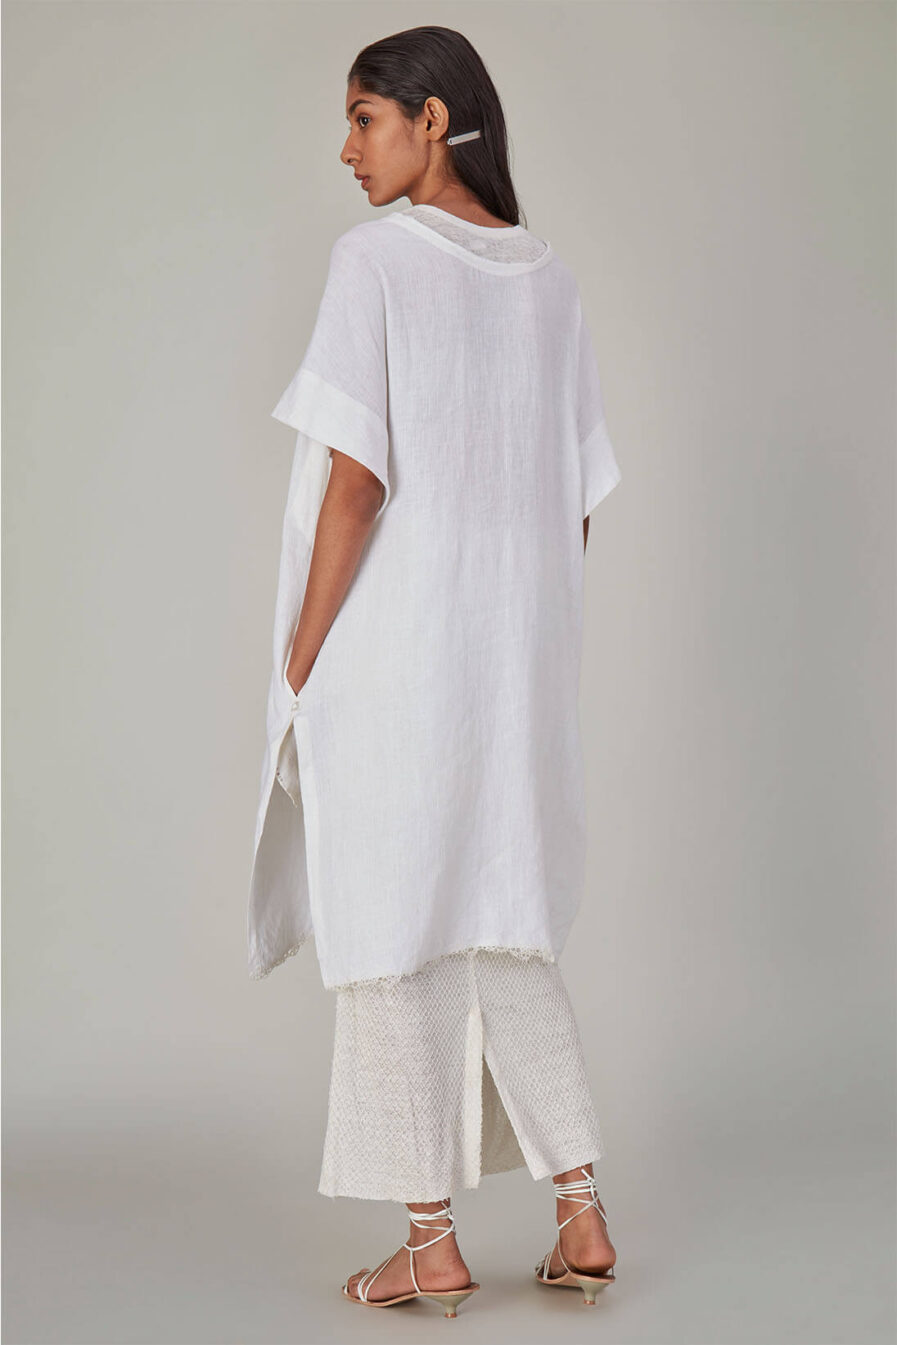 Anavila Fish Net Jersey Skirt